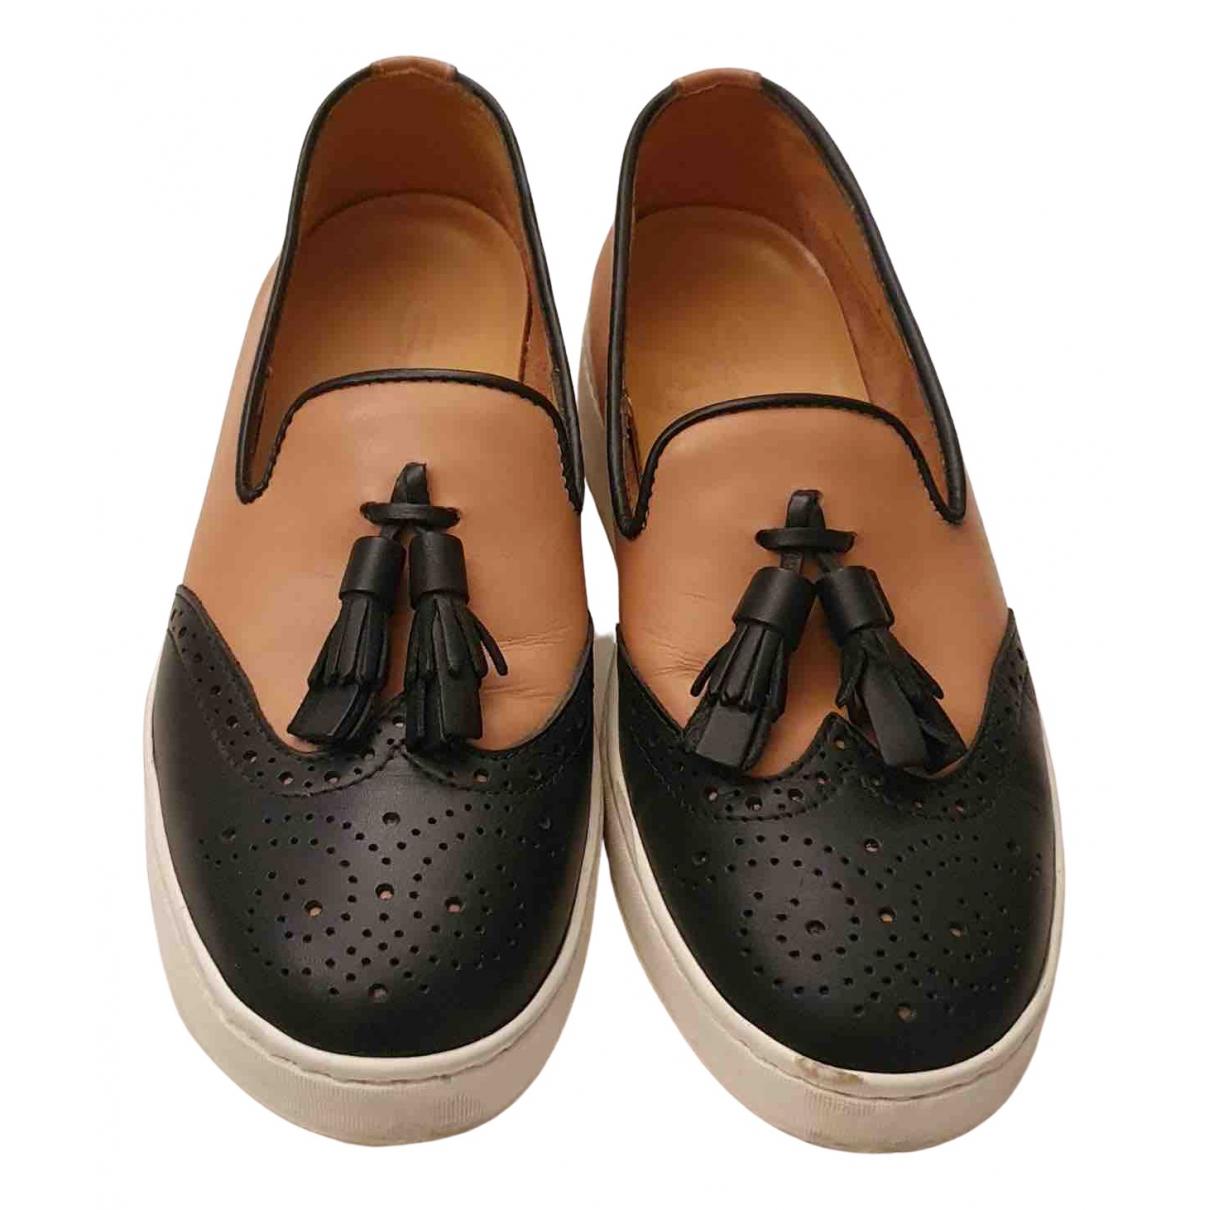 Santoni \N Camel Leather Flats for Women 37.5 EU